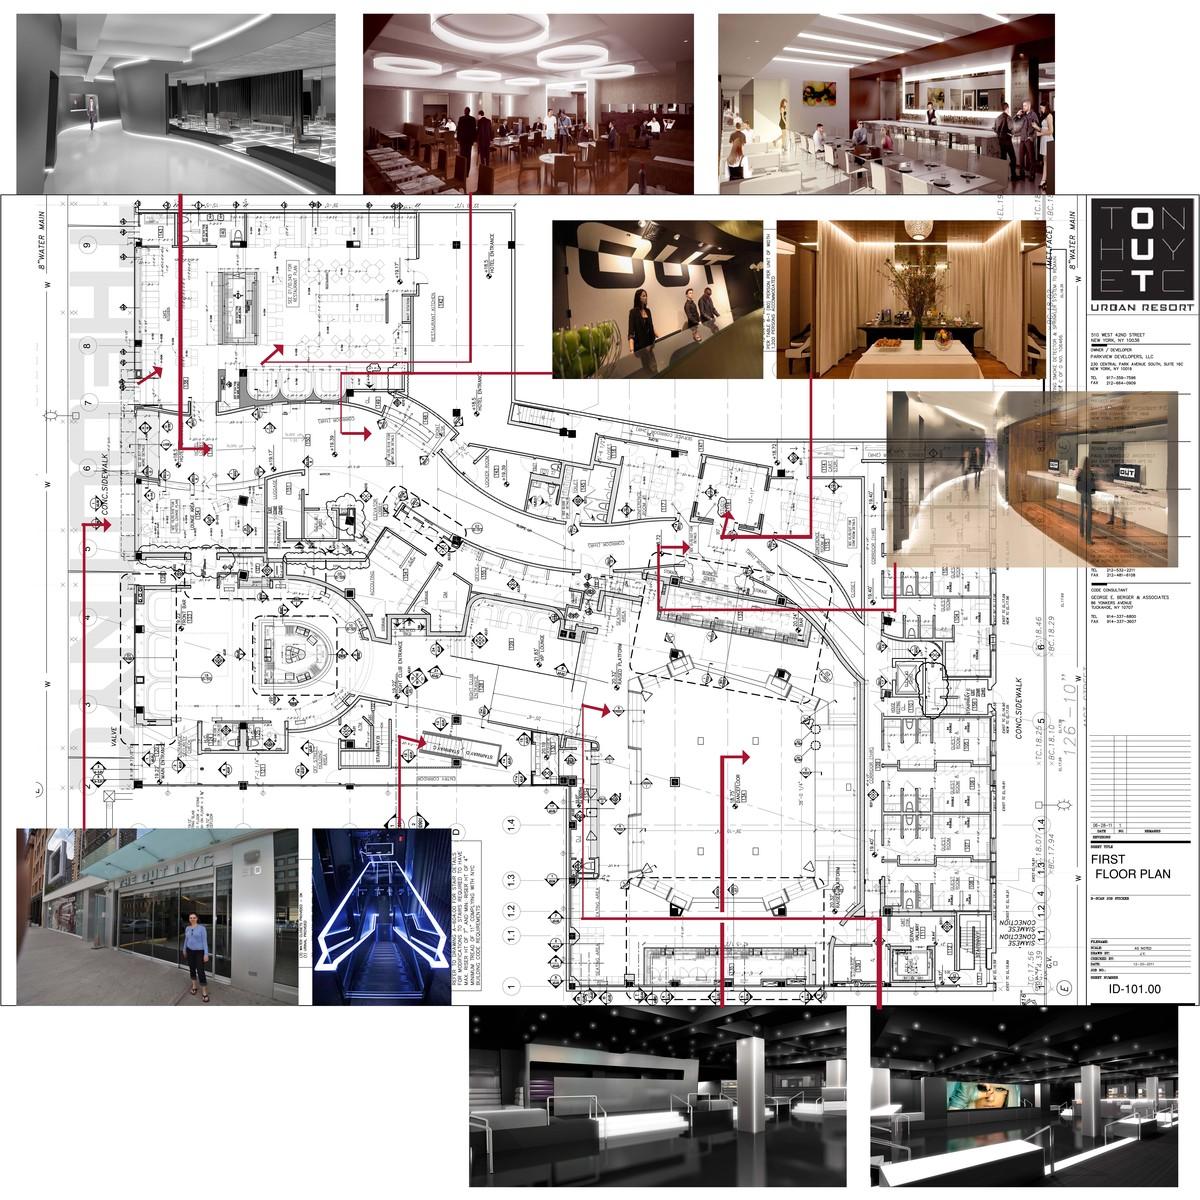 First floor Plan - Club,Dance Floor,Bar,Hotel Lobby,Reception